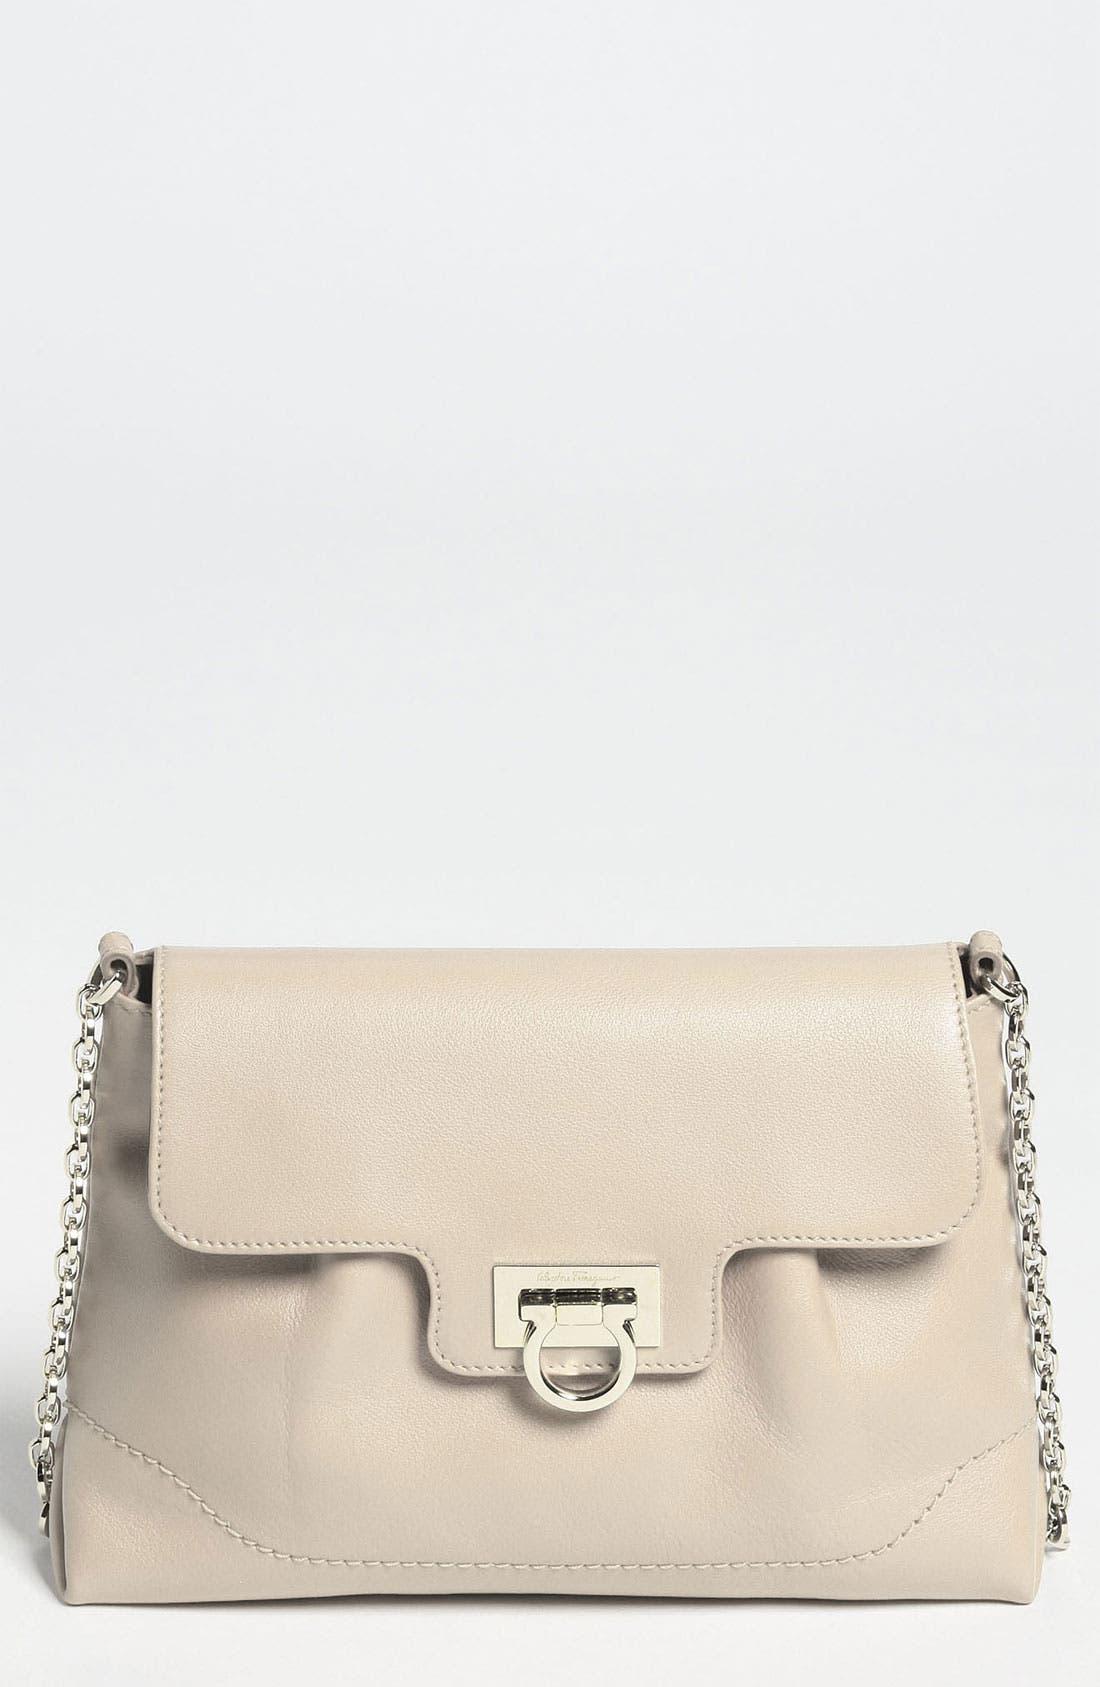 Main Image - Salvatore Ferragamo 'Amelie' Leather Shoulder Bag